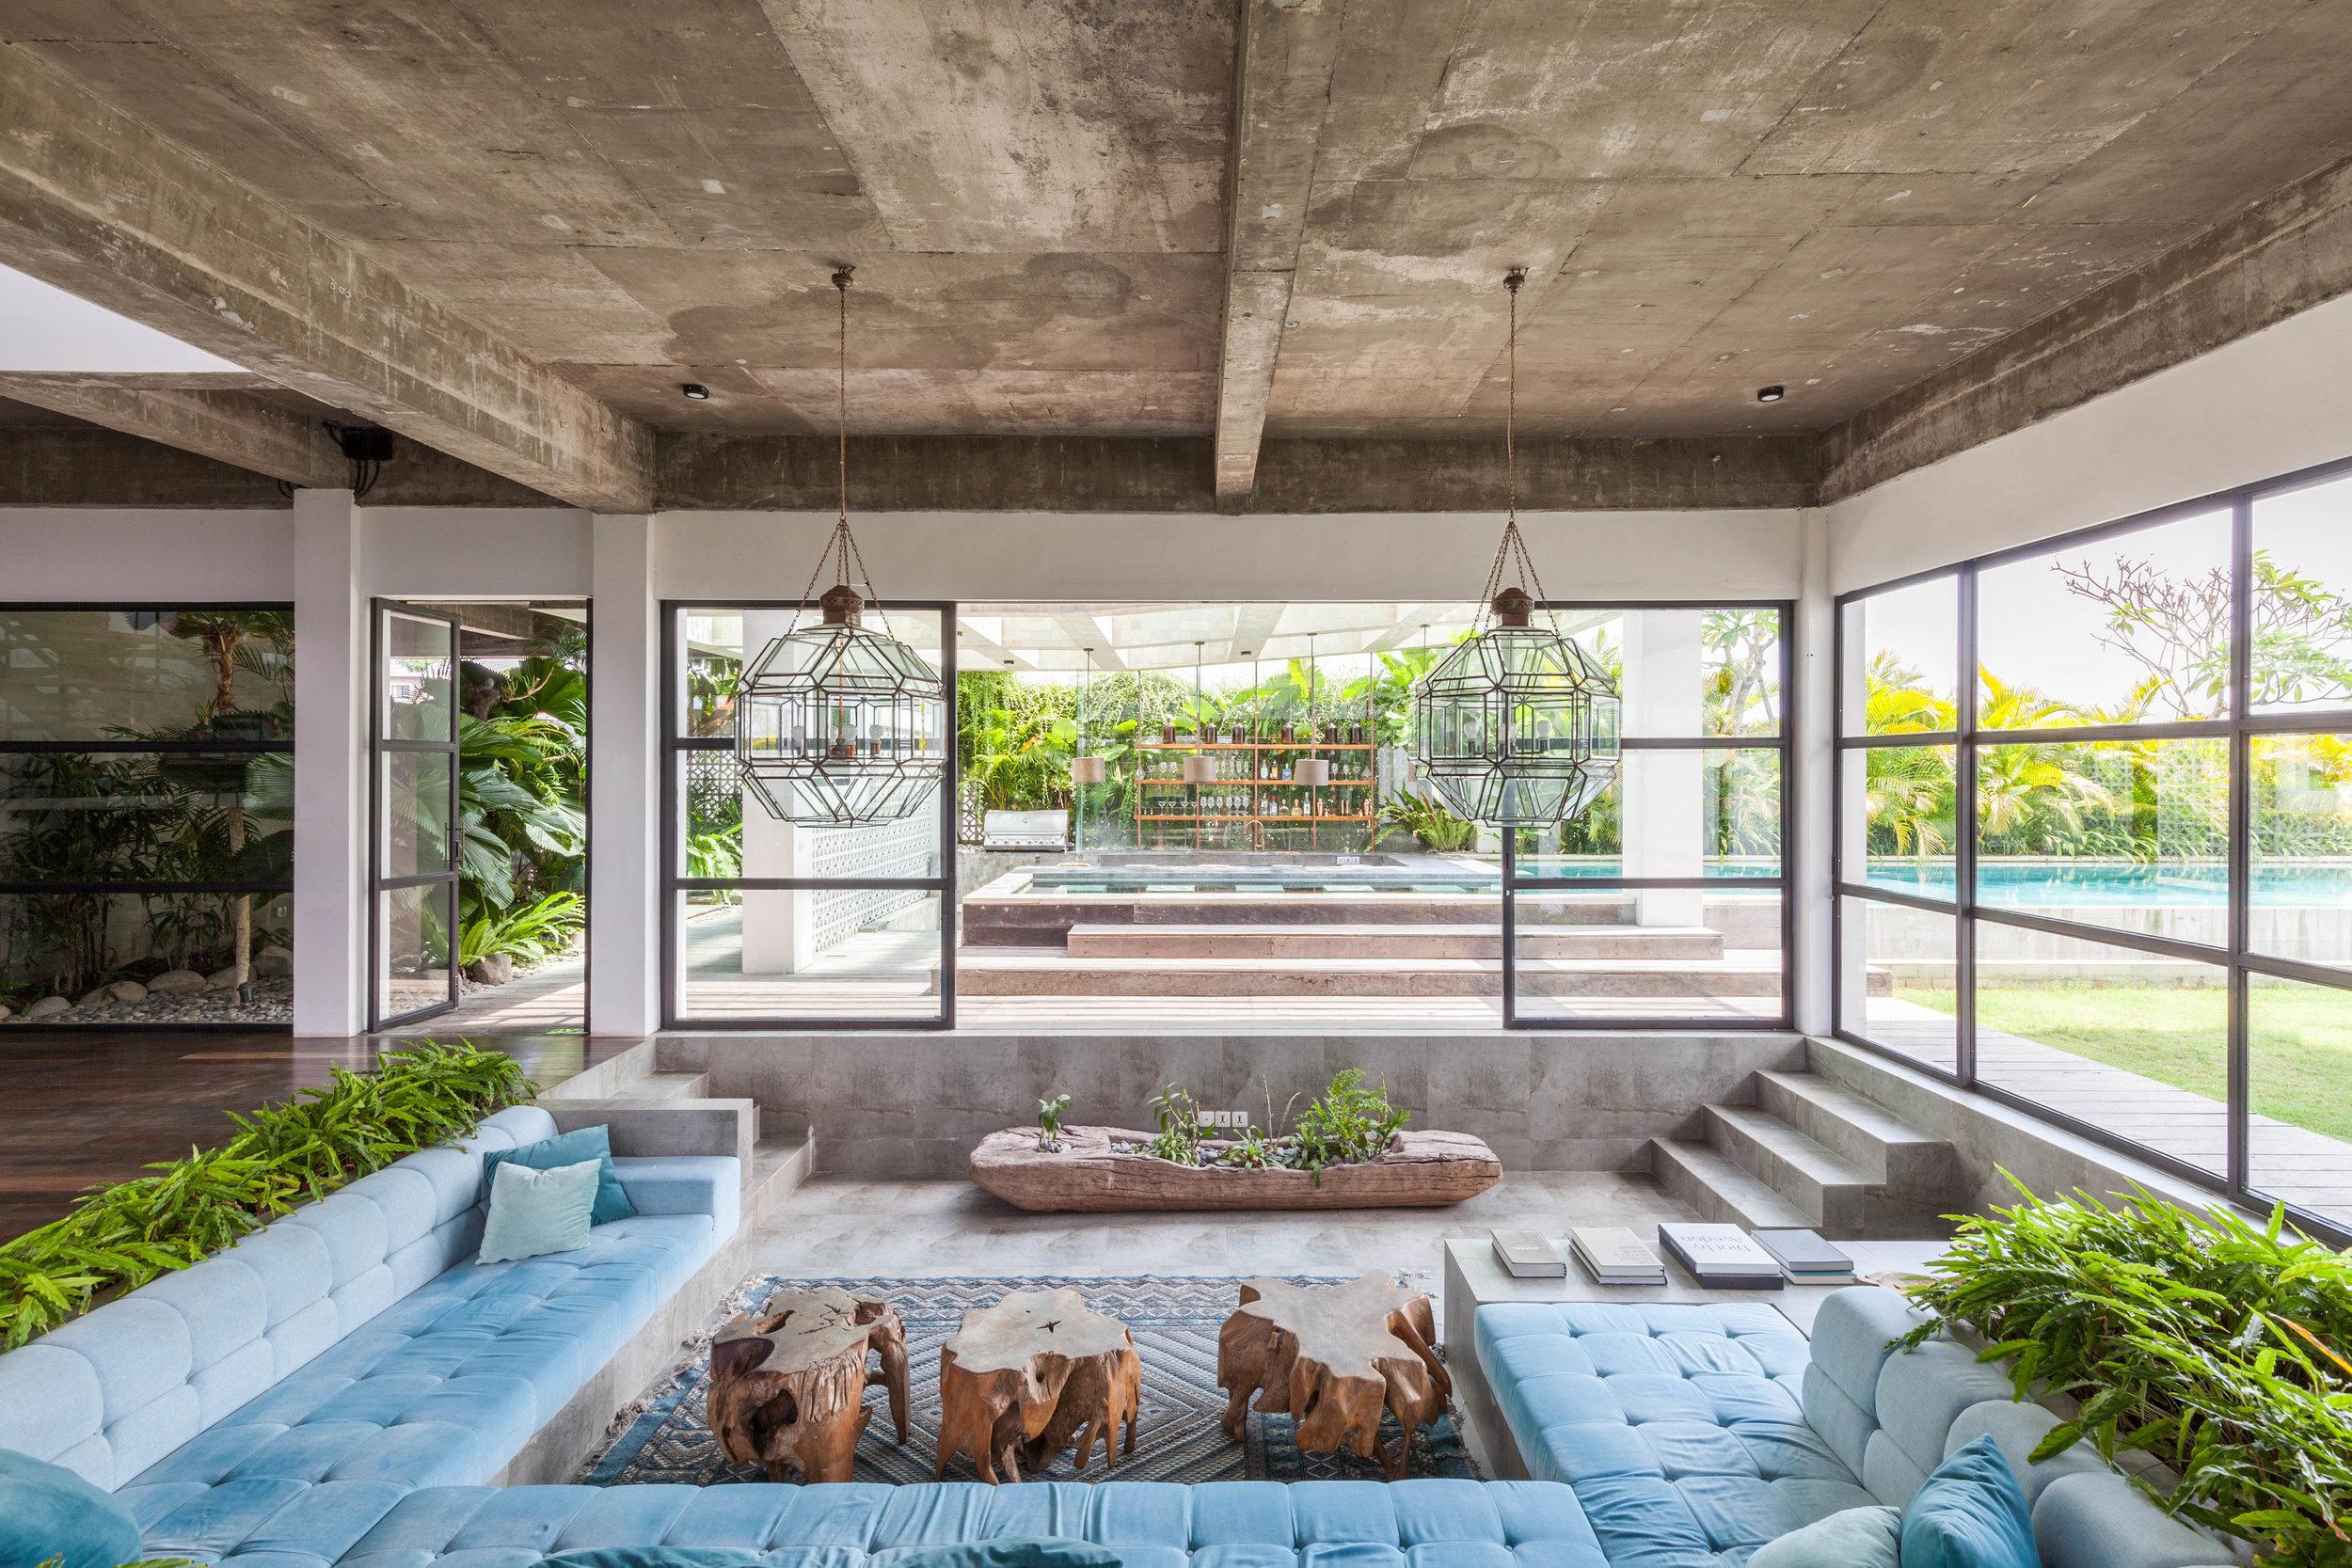 Bali InteriorsMandala House-25.jpg